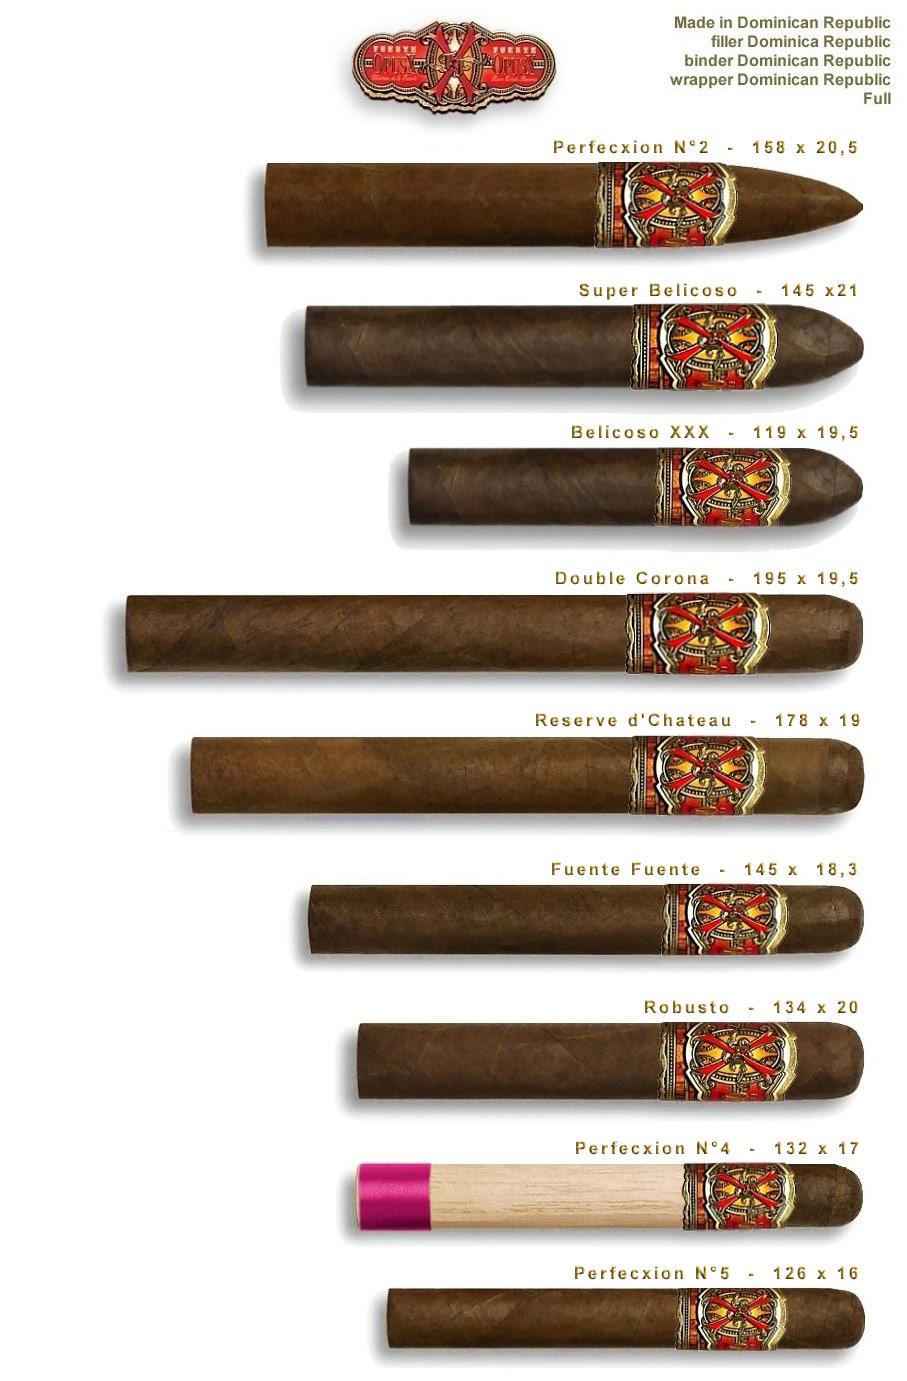 arturo_fuente_cigars_cigarmonkeys_6.jpg